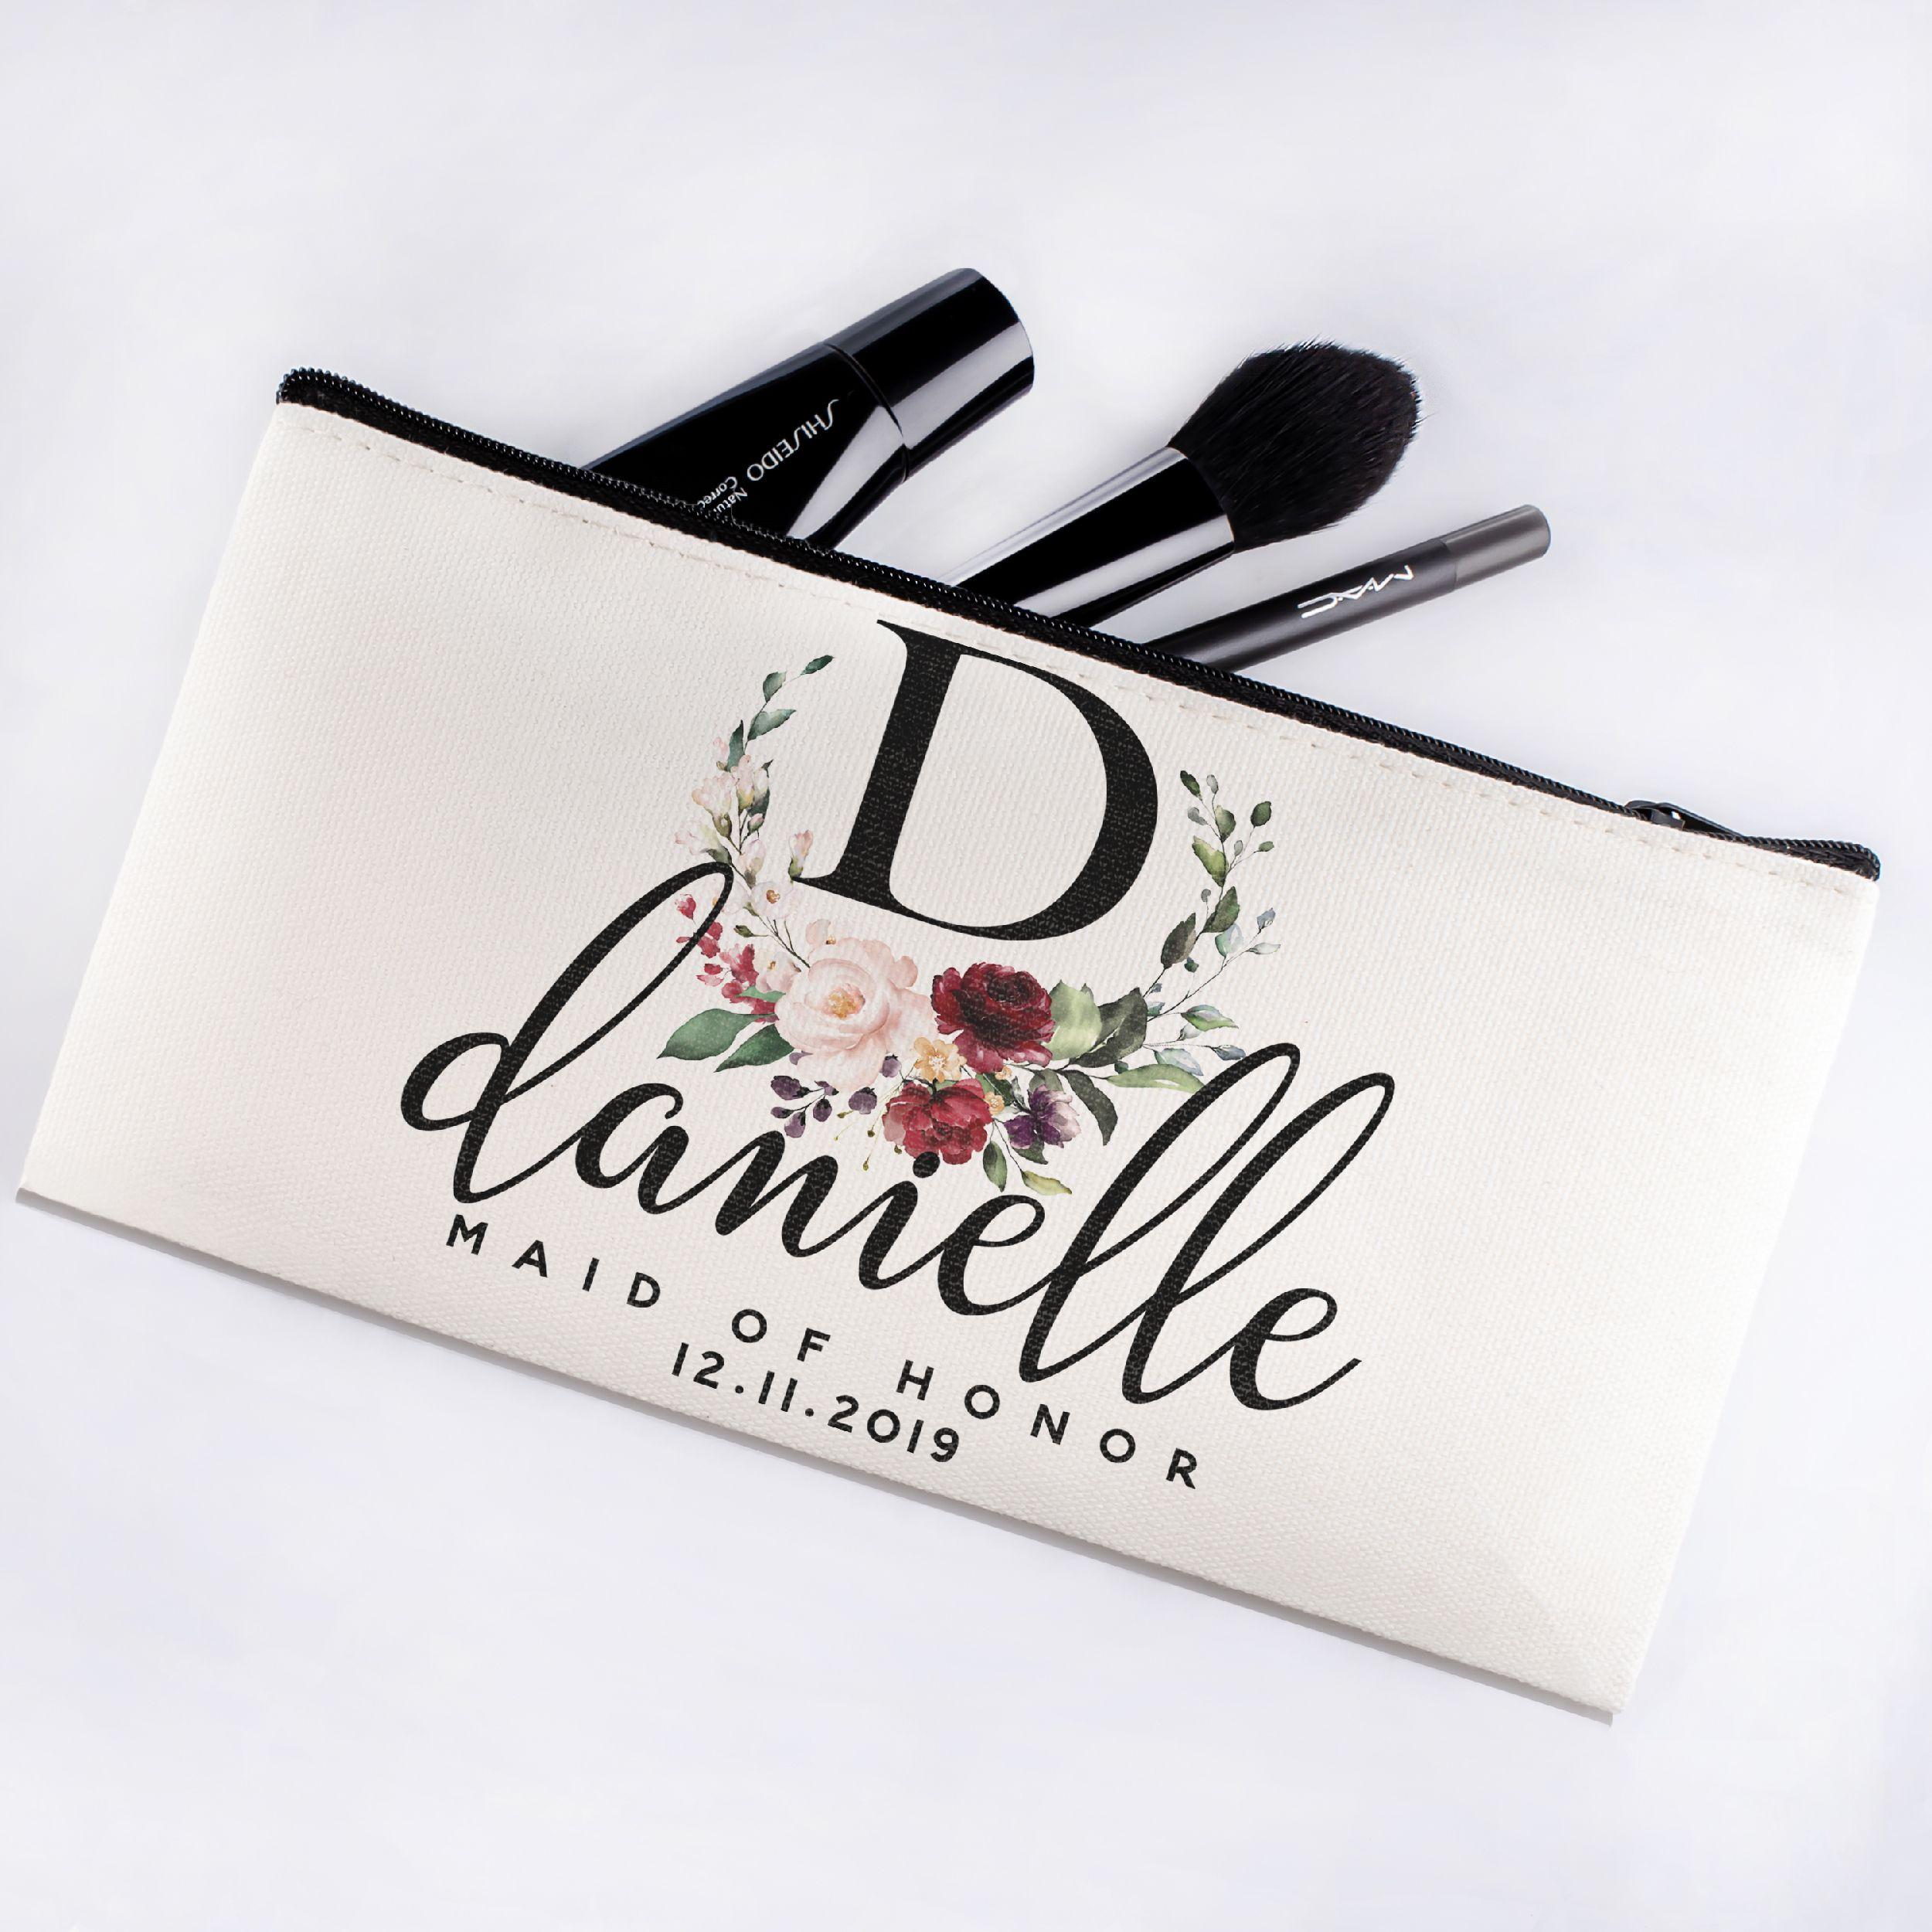 Personalized Makeup Bag Bridesmaid | Wedding Customized ...